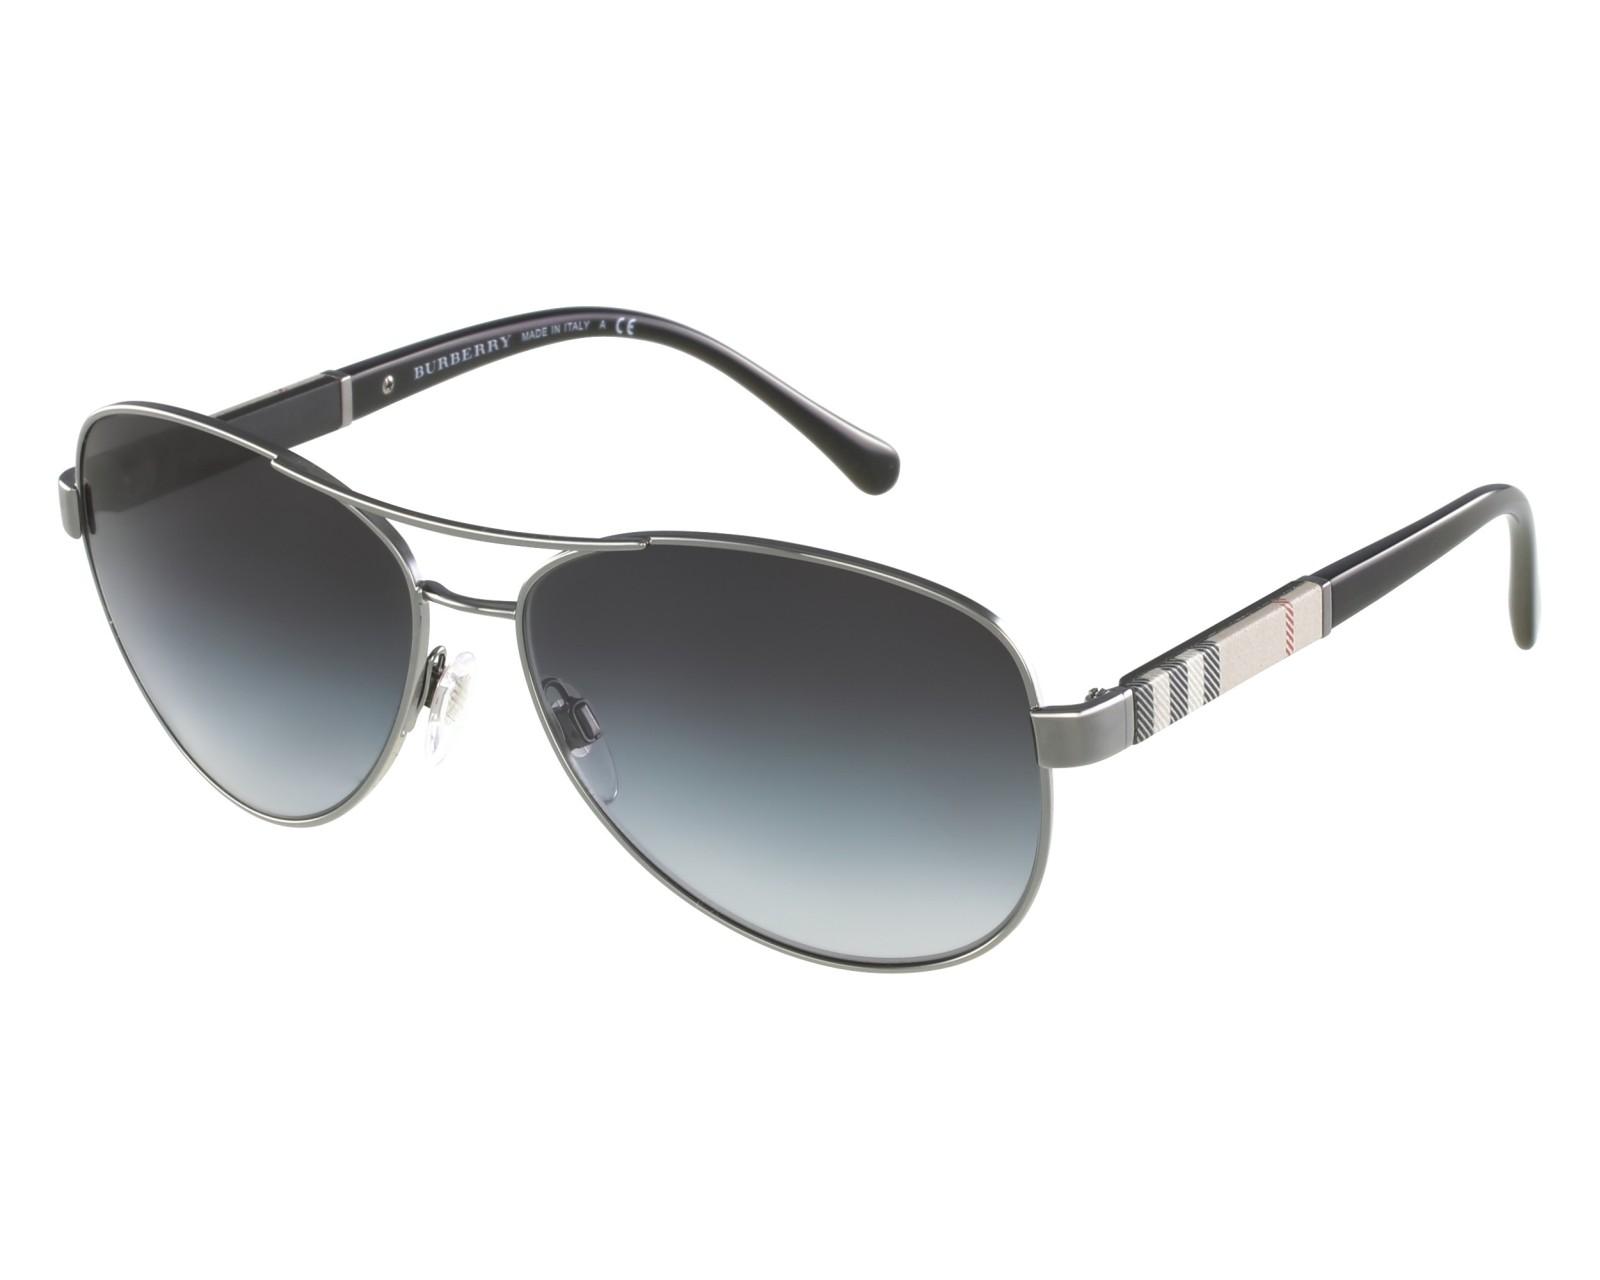 b9ec1a585d3 Sunglasses Burberry BE-3080 1003 8G 59-14 Silver Beige front view